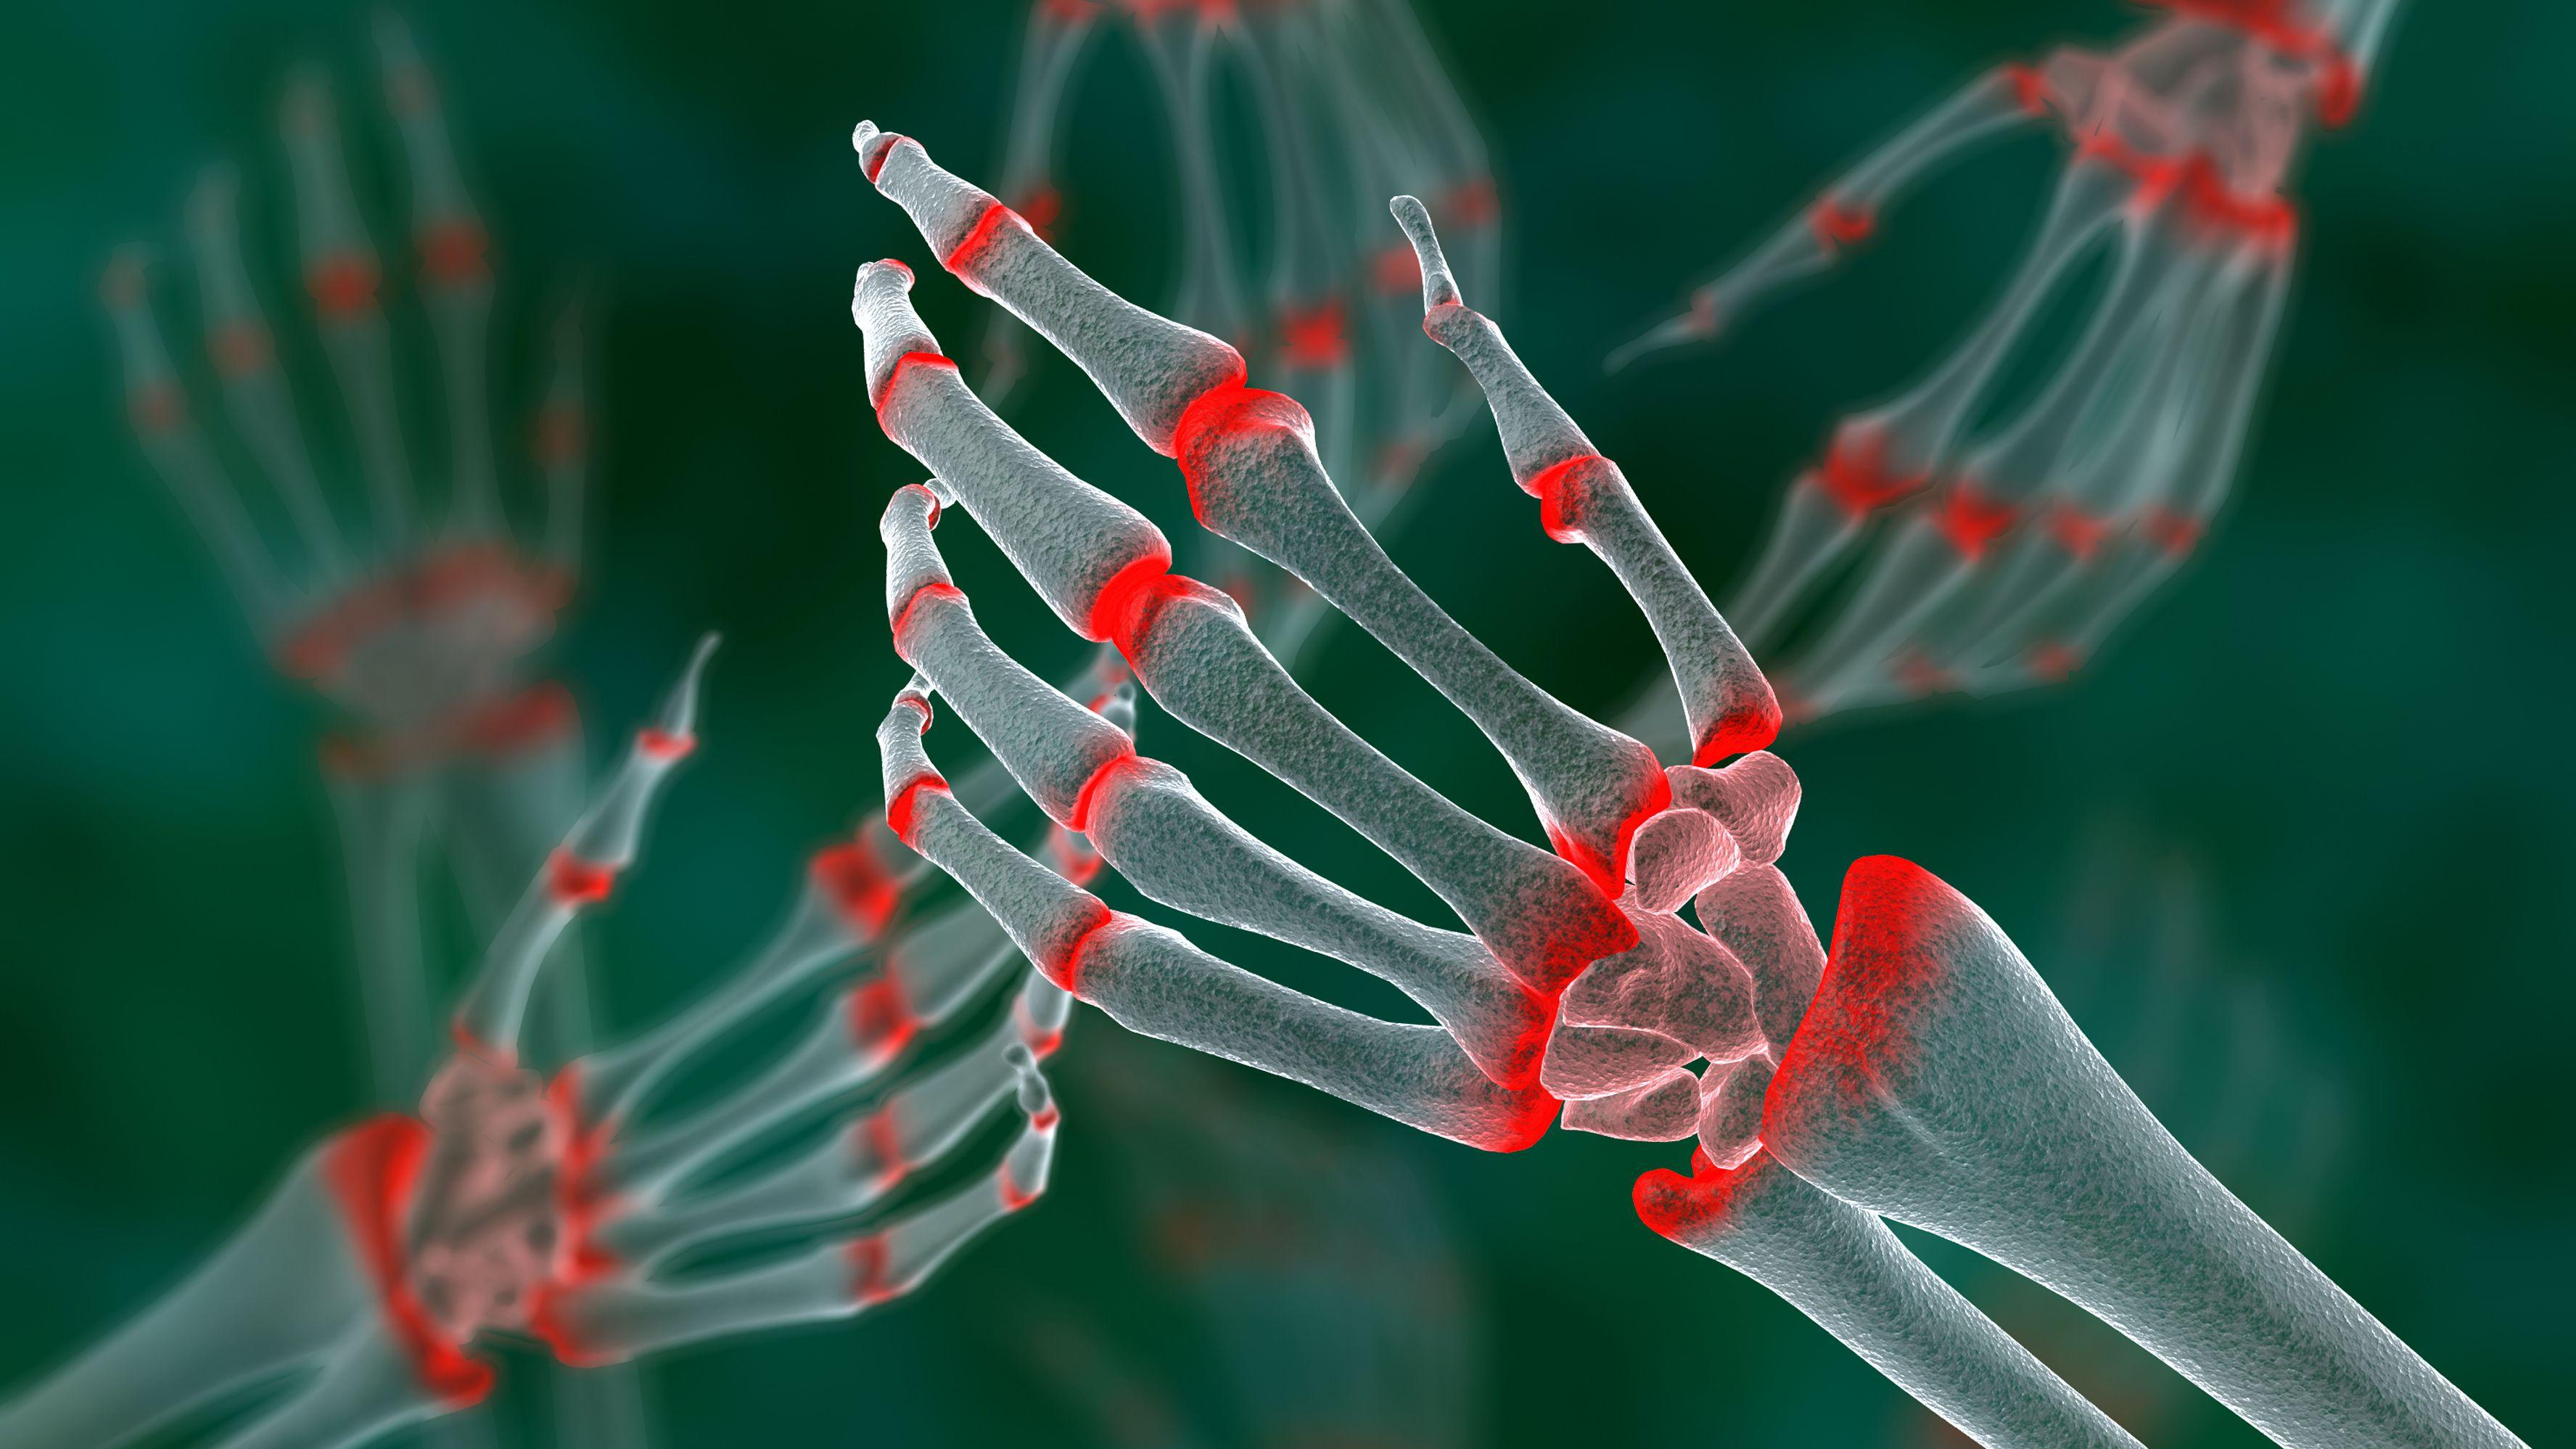 Rheumatoid Arthritis: Signs, Symptoms, and Complications